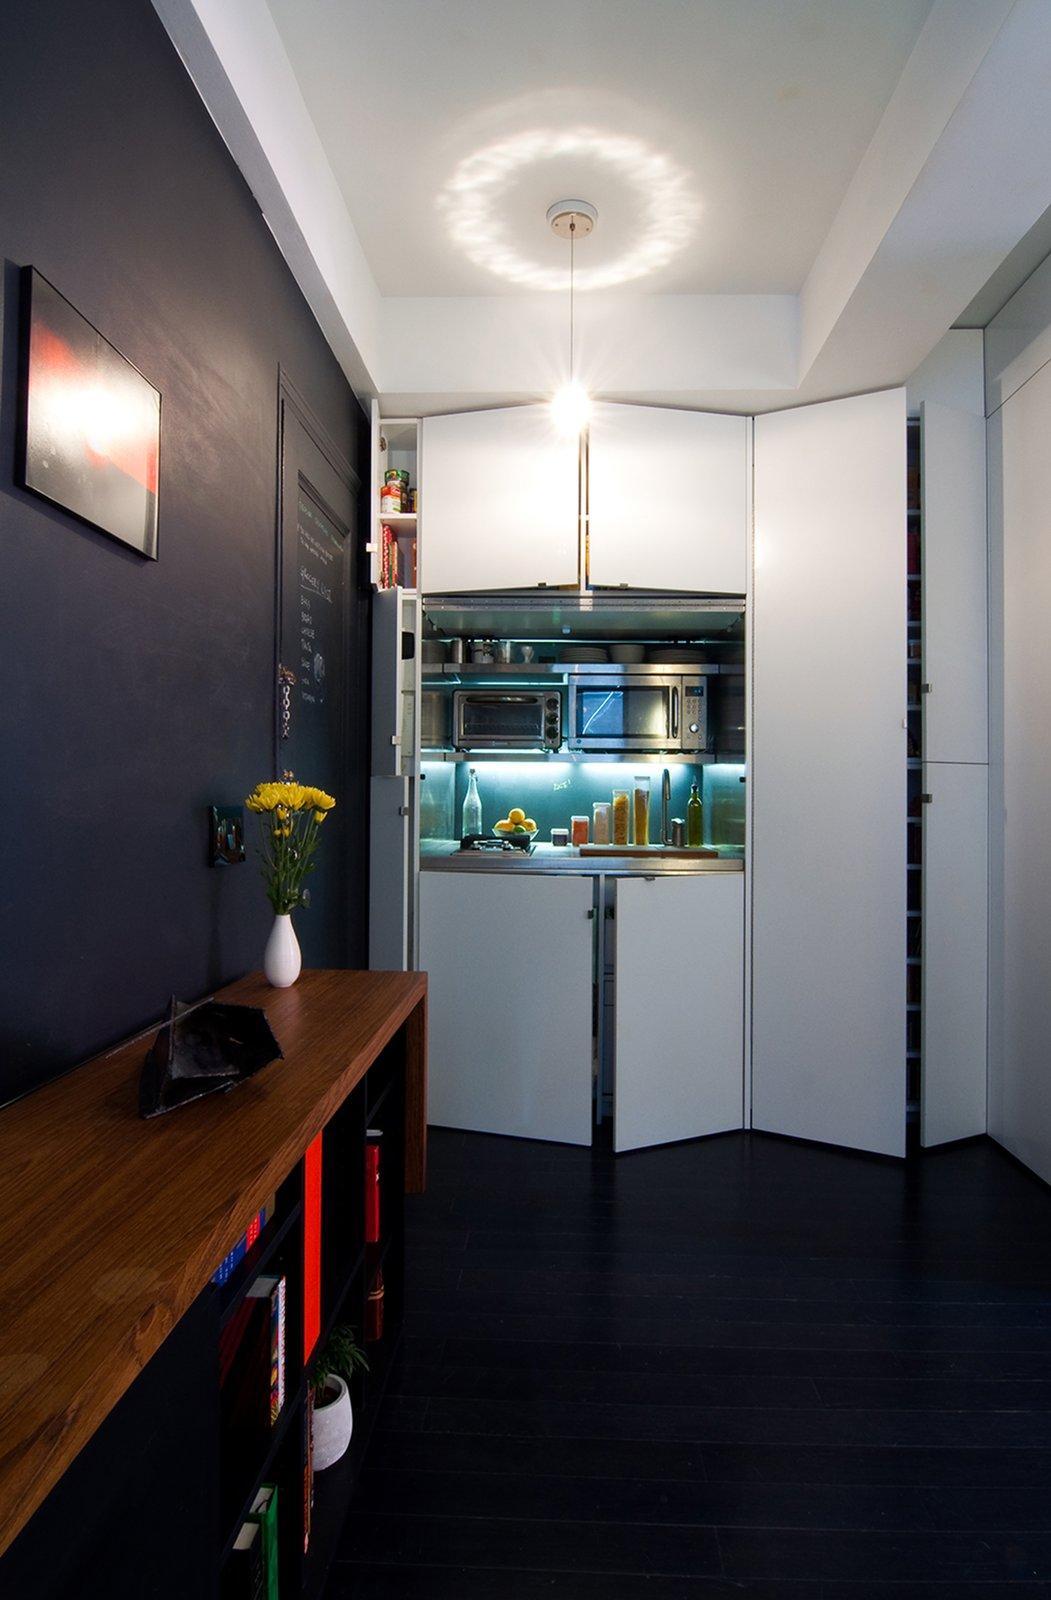 Kitchen, White Cabinet, Bamboo Floor, Metal Backsplashe, Microwave, Metal Counter, Wood Counter, Cooktops, Range, Pendant Lighting, Ceiling Lighting, Refrigerator, and Undermount Sink  Park Avenue Studio